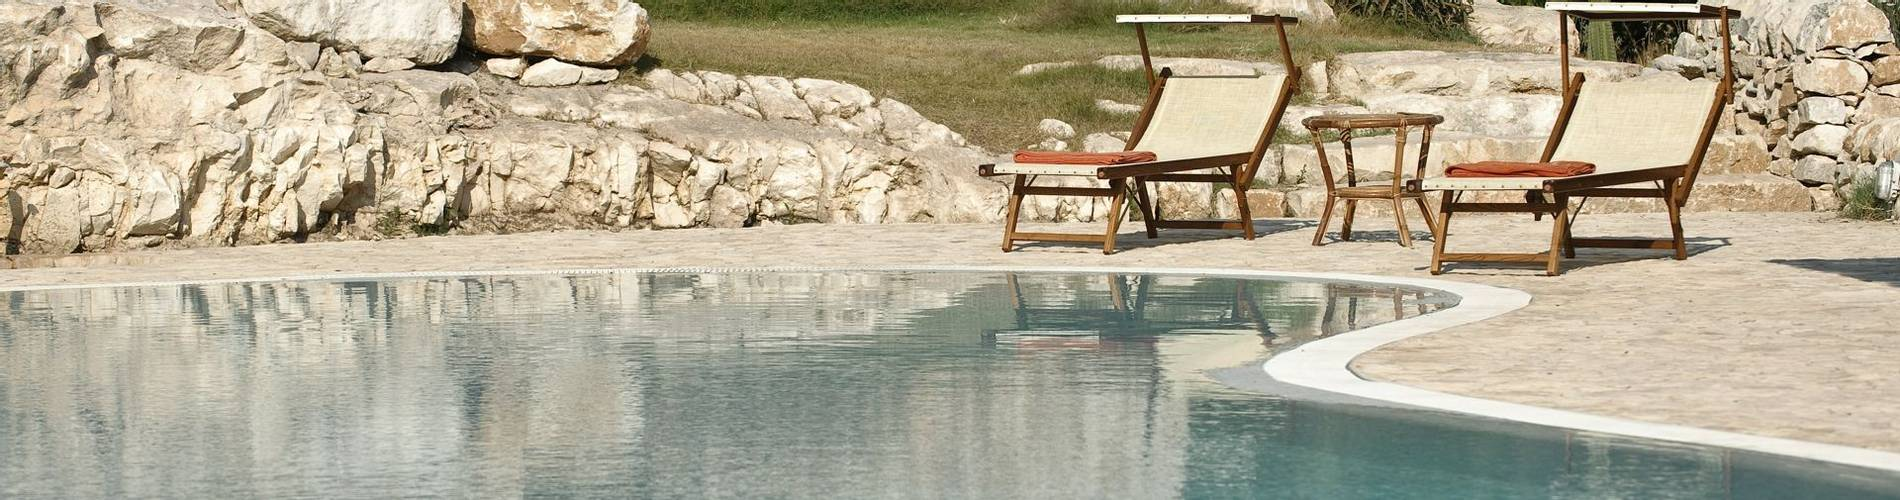 Parco Cavalonga, Sicily, Italy (15).jpg